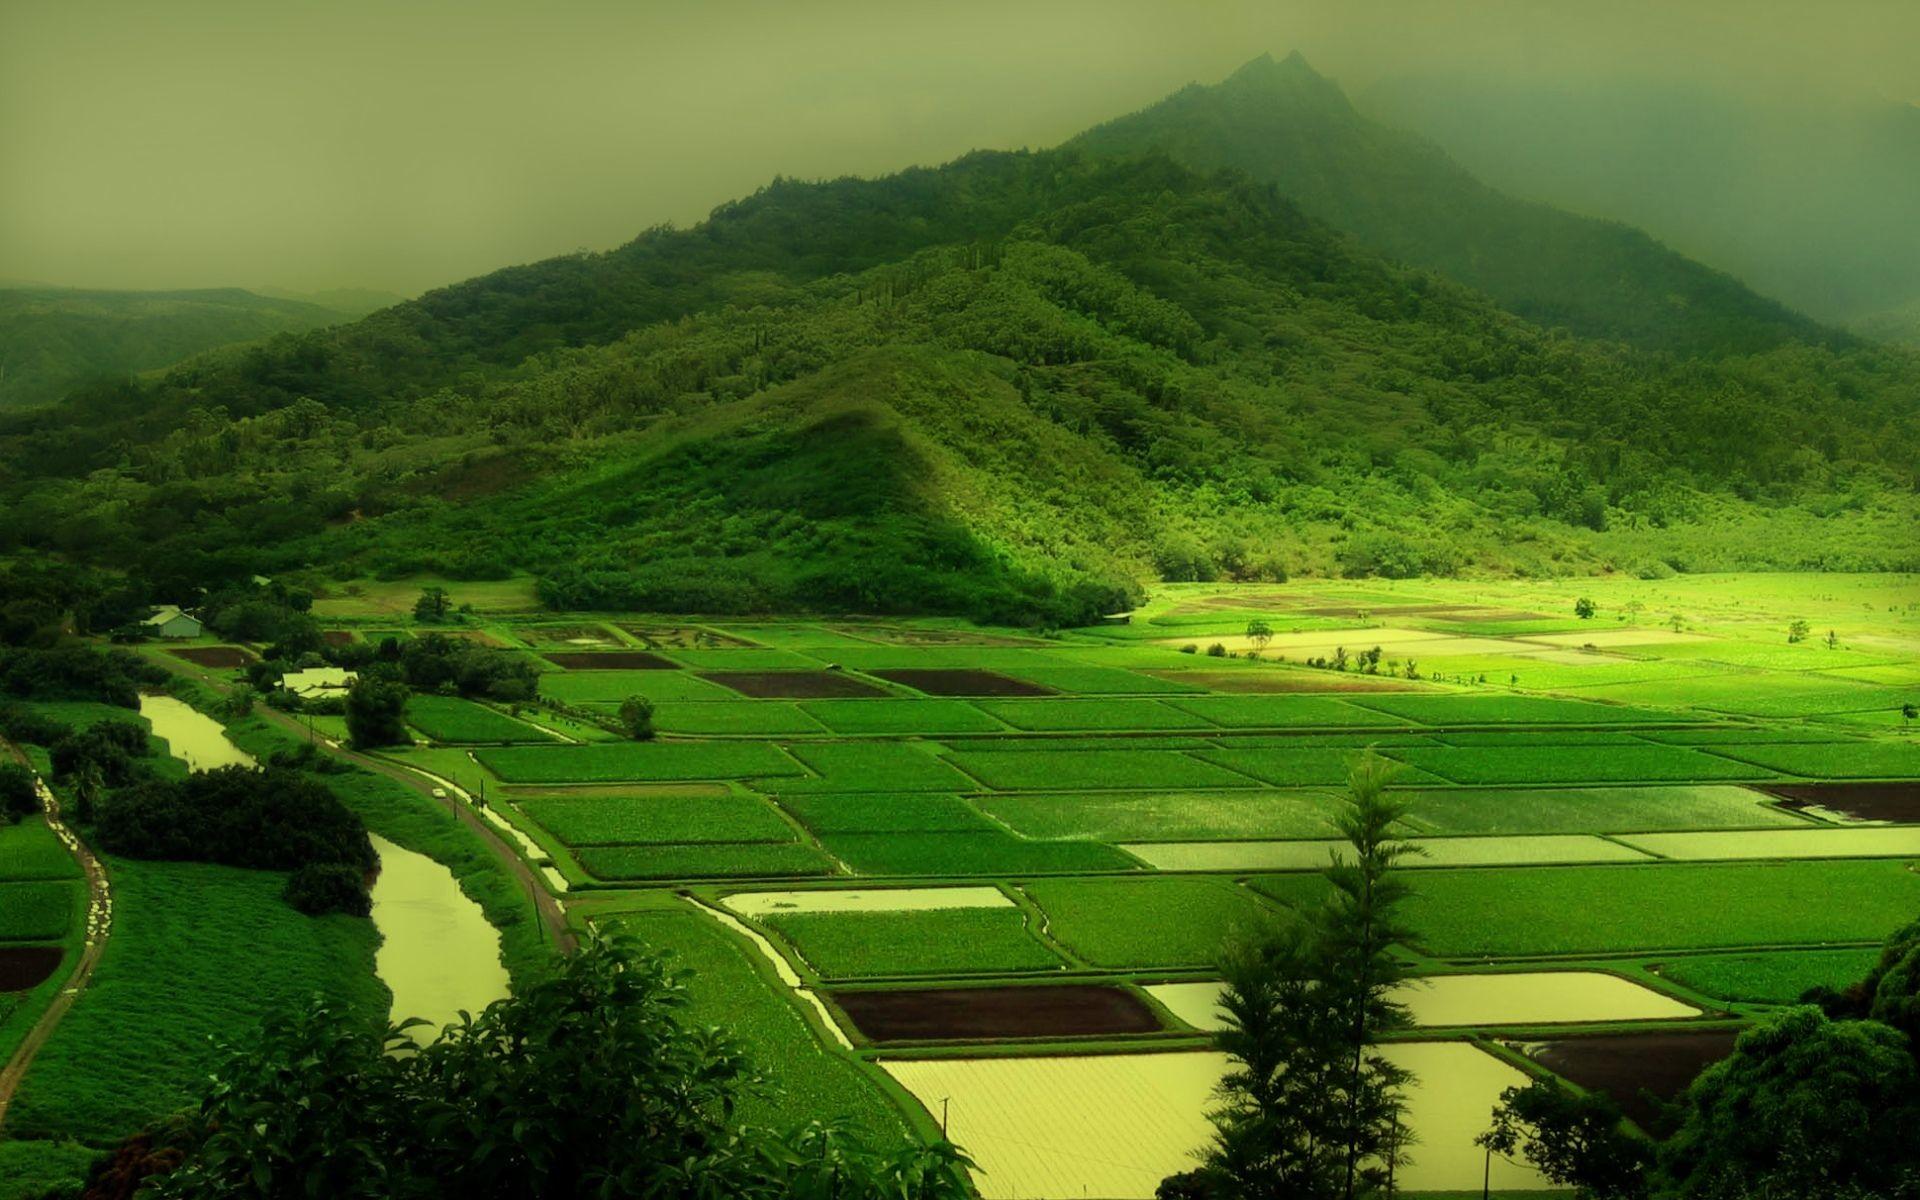 Hd Landscape Wallpapers High Resolution Full 4k Ultra 16k 1080p 4k .